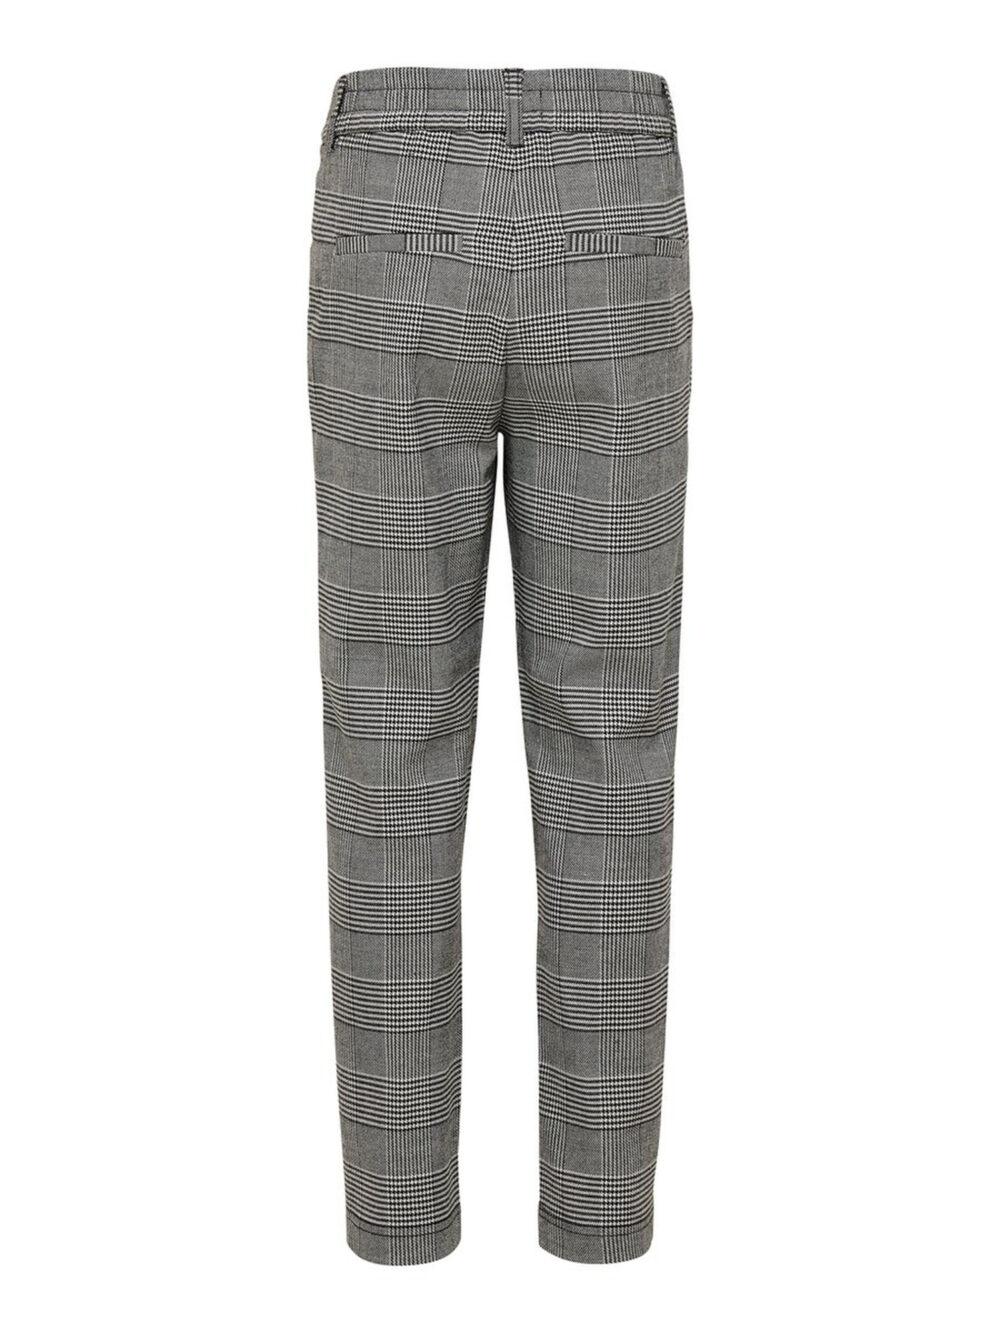 Kids Only Poptrash Soft Check Pant Medium Grey